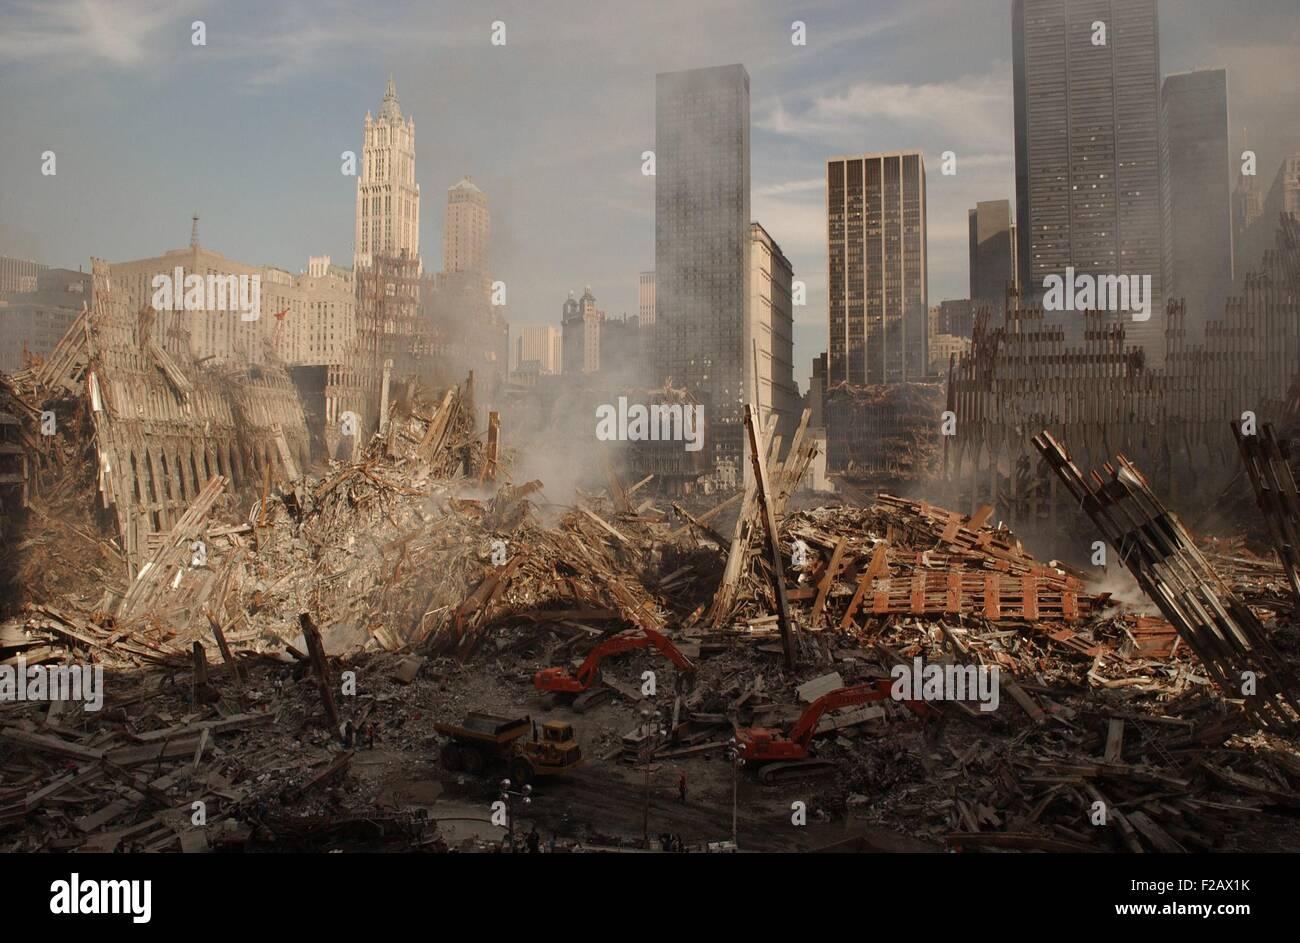 Aishwarya rai action replay - Recherche Google aishwarya rai in 9 11 world trade center photos